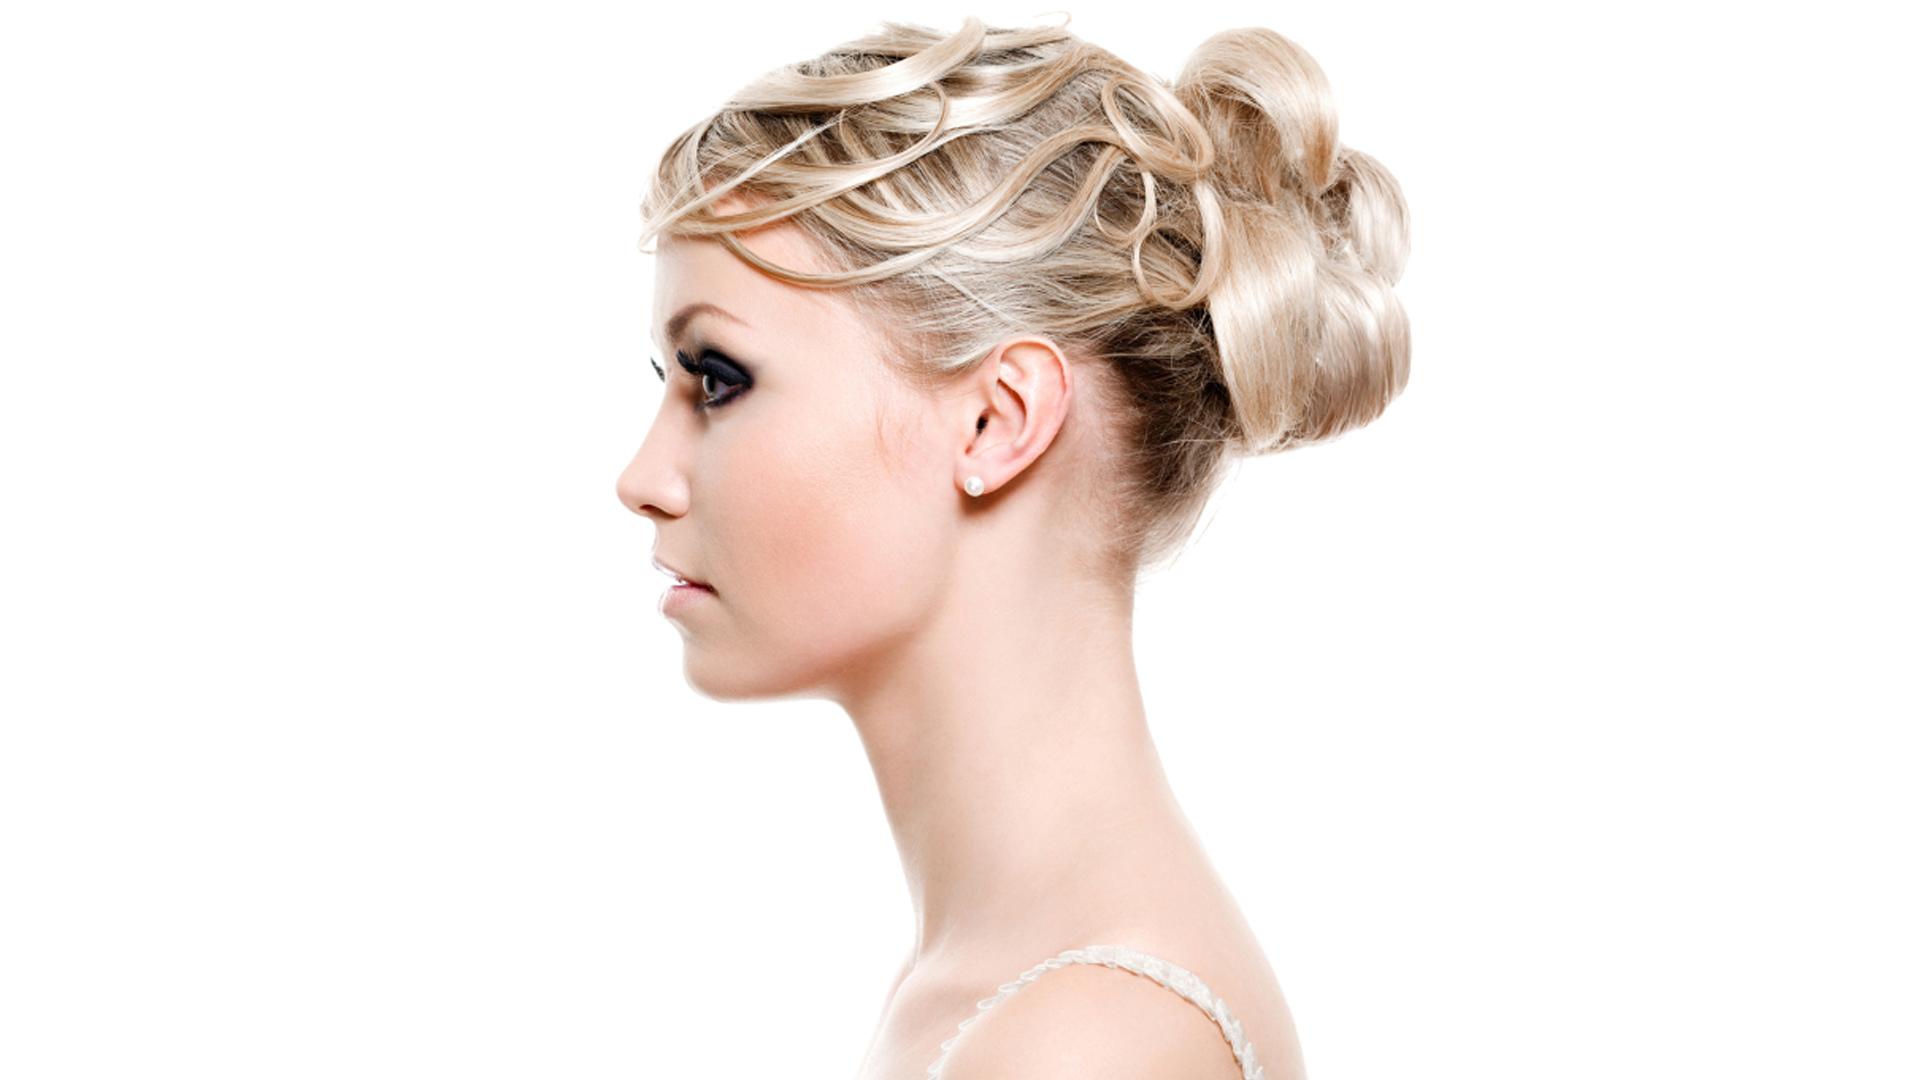 Anthony Jones Hair Salons Hair Style Selection 1037